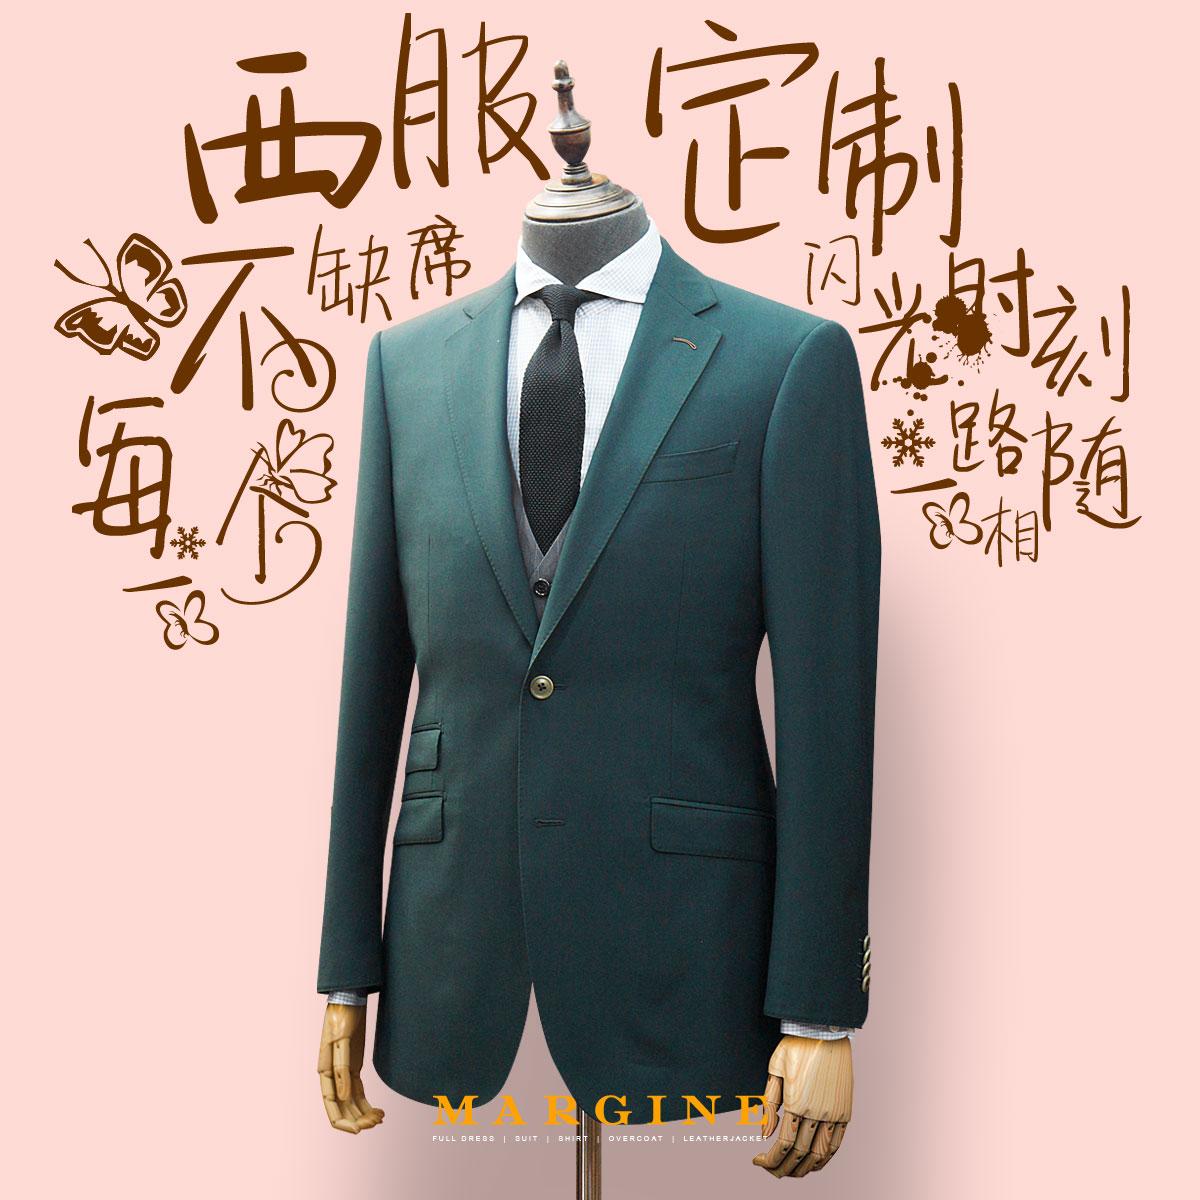 Shanghai Hangzhou suit customization high end handmade tailored suit customized business Korean mens wear